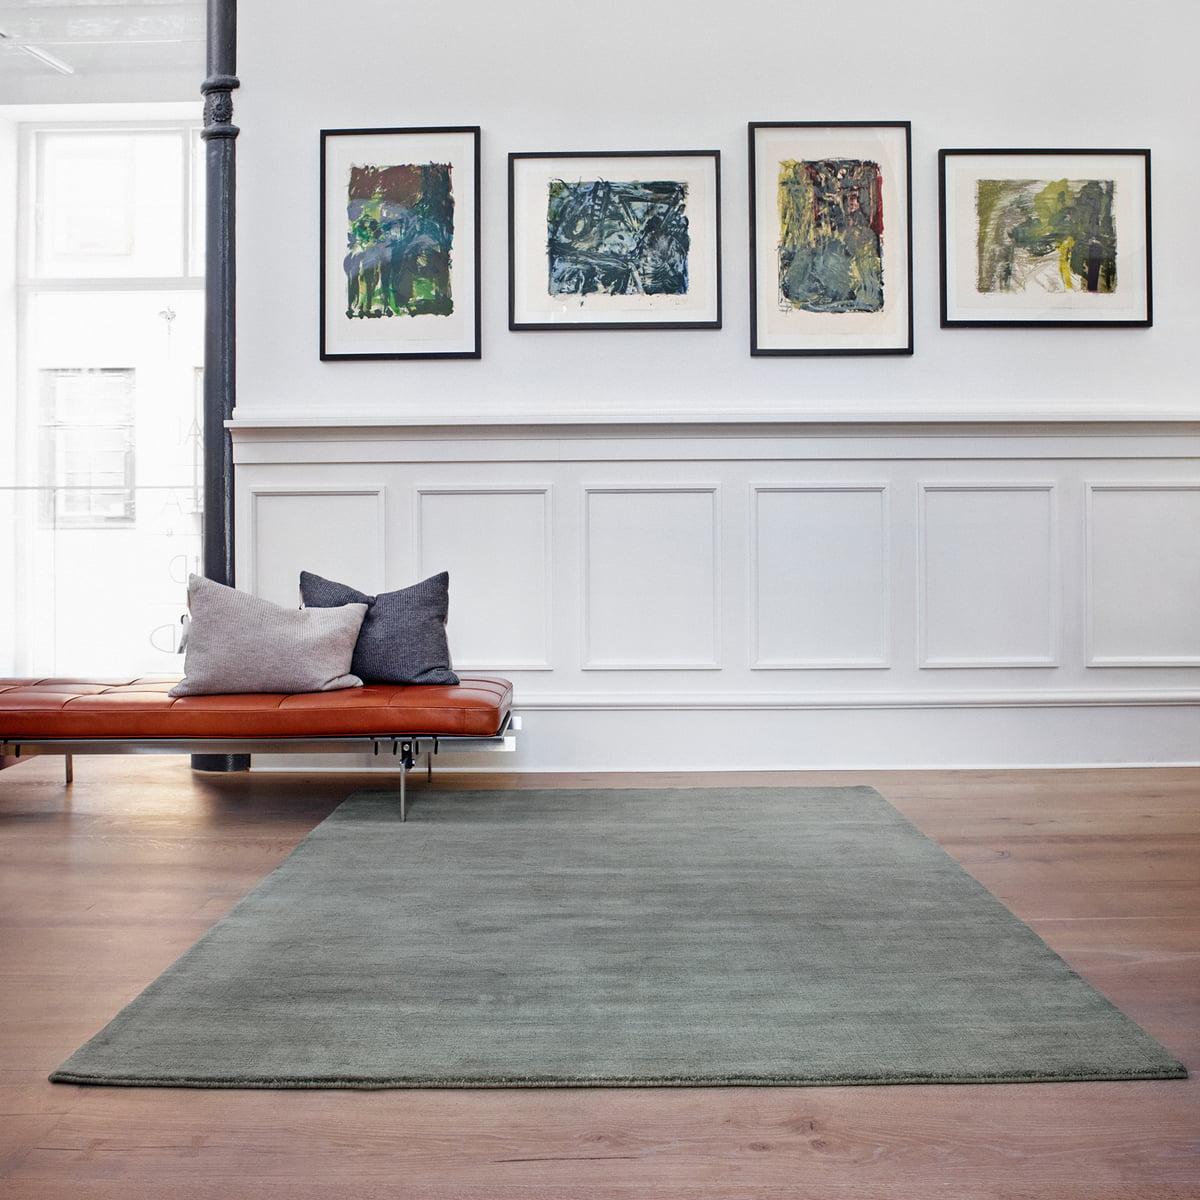 earth teppich von massimo connox. Black Bedroom Furniture Sets. Home Design Ideas